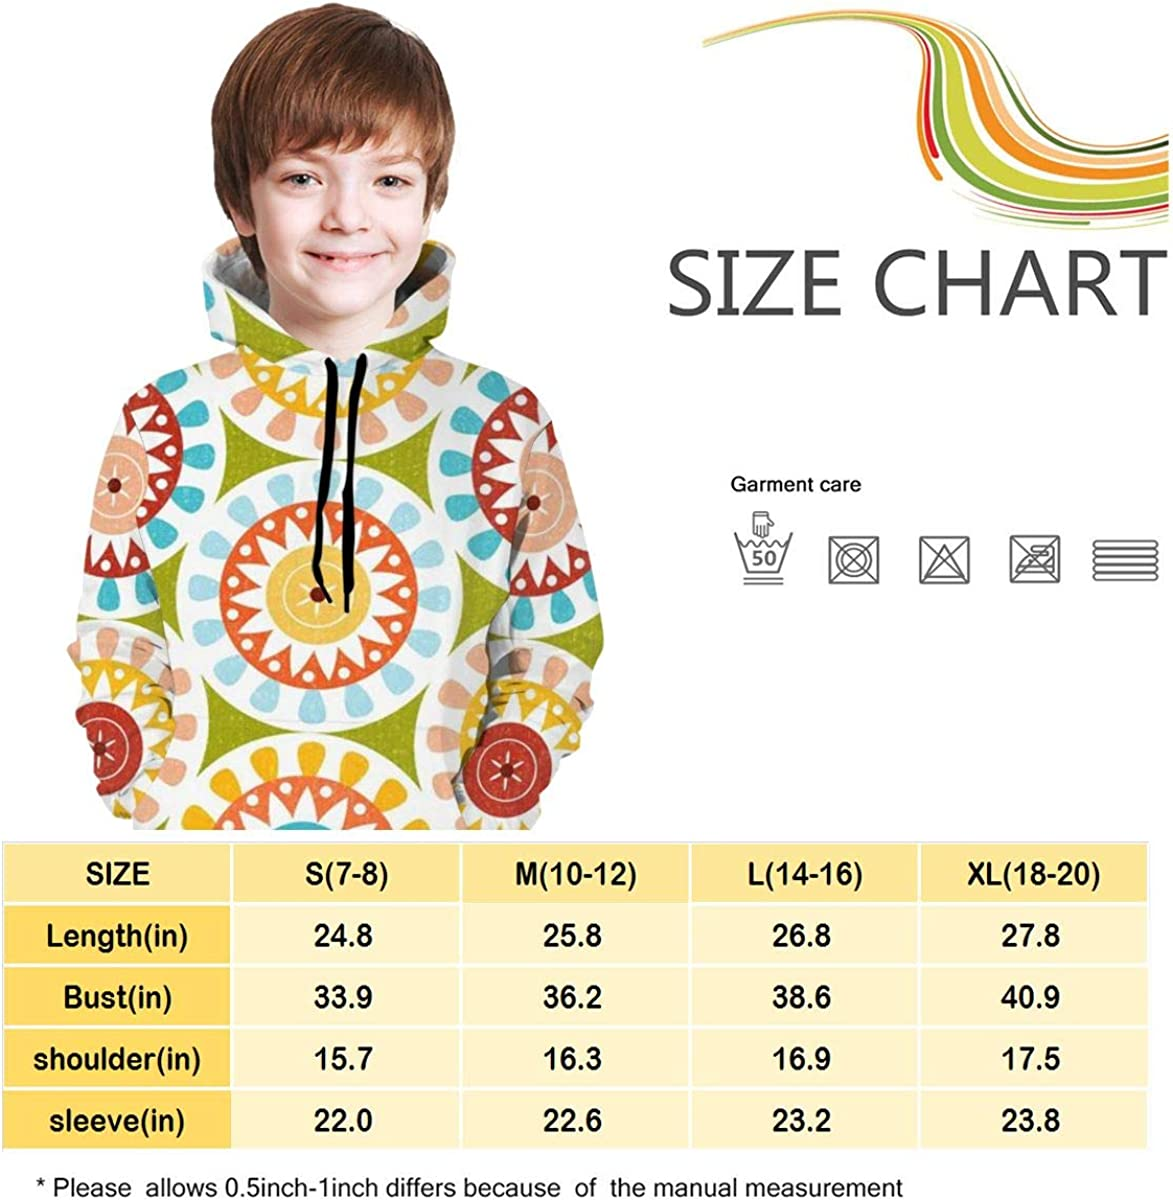 Kjiurhfyheuij Teen Pullover Hoodies with Pocket Floral Pattern Soft Fleece Hooded Sweatshirt for Youth Teens Kids Boys Girls